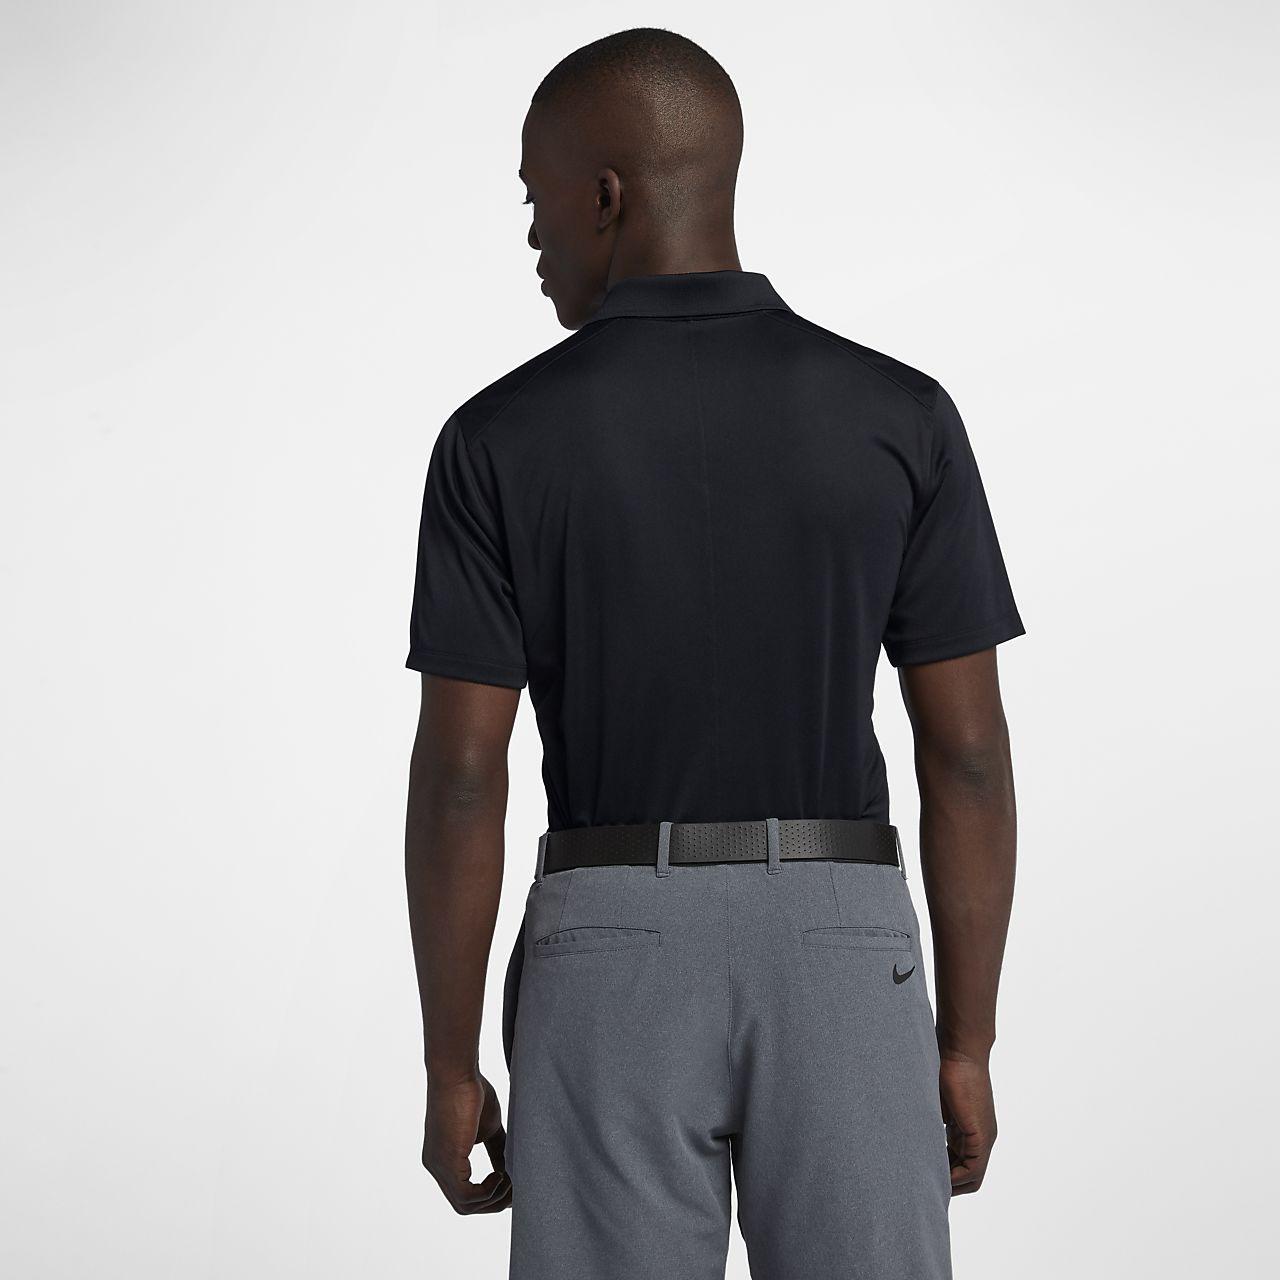 79cbfecc3 Nike Dri-FIT Victory Men's Golf Polo. Nike.com